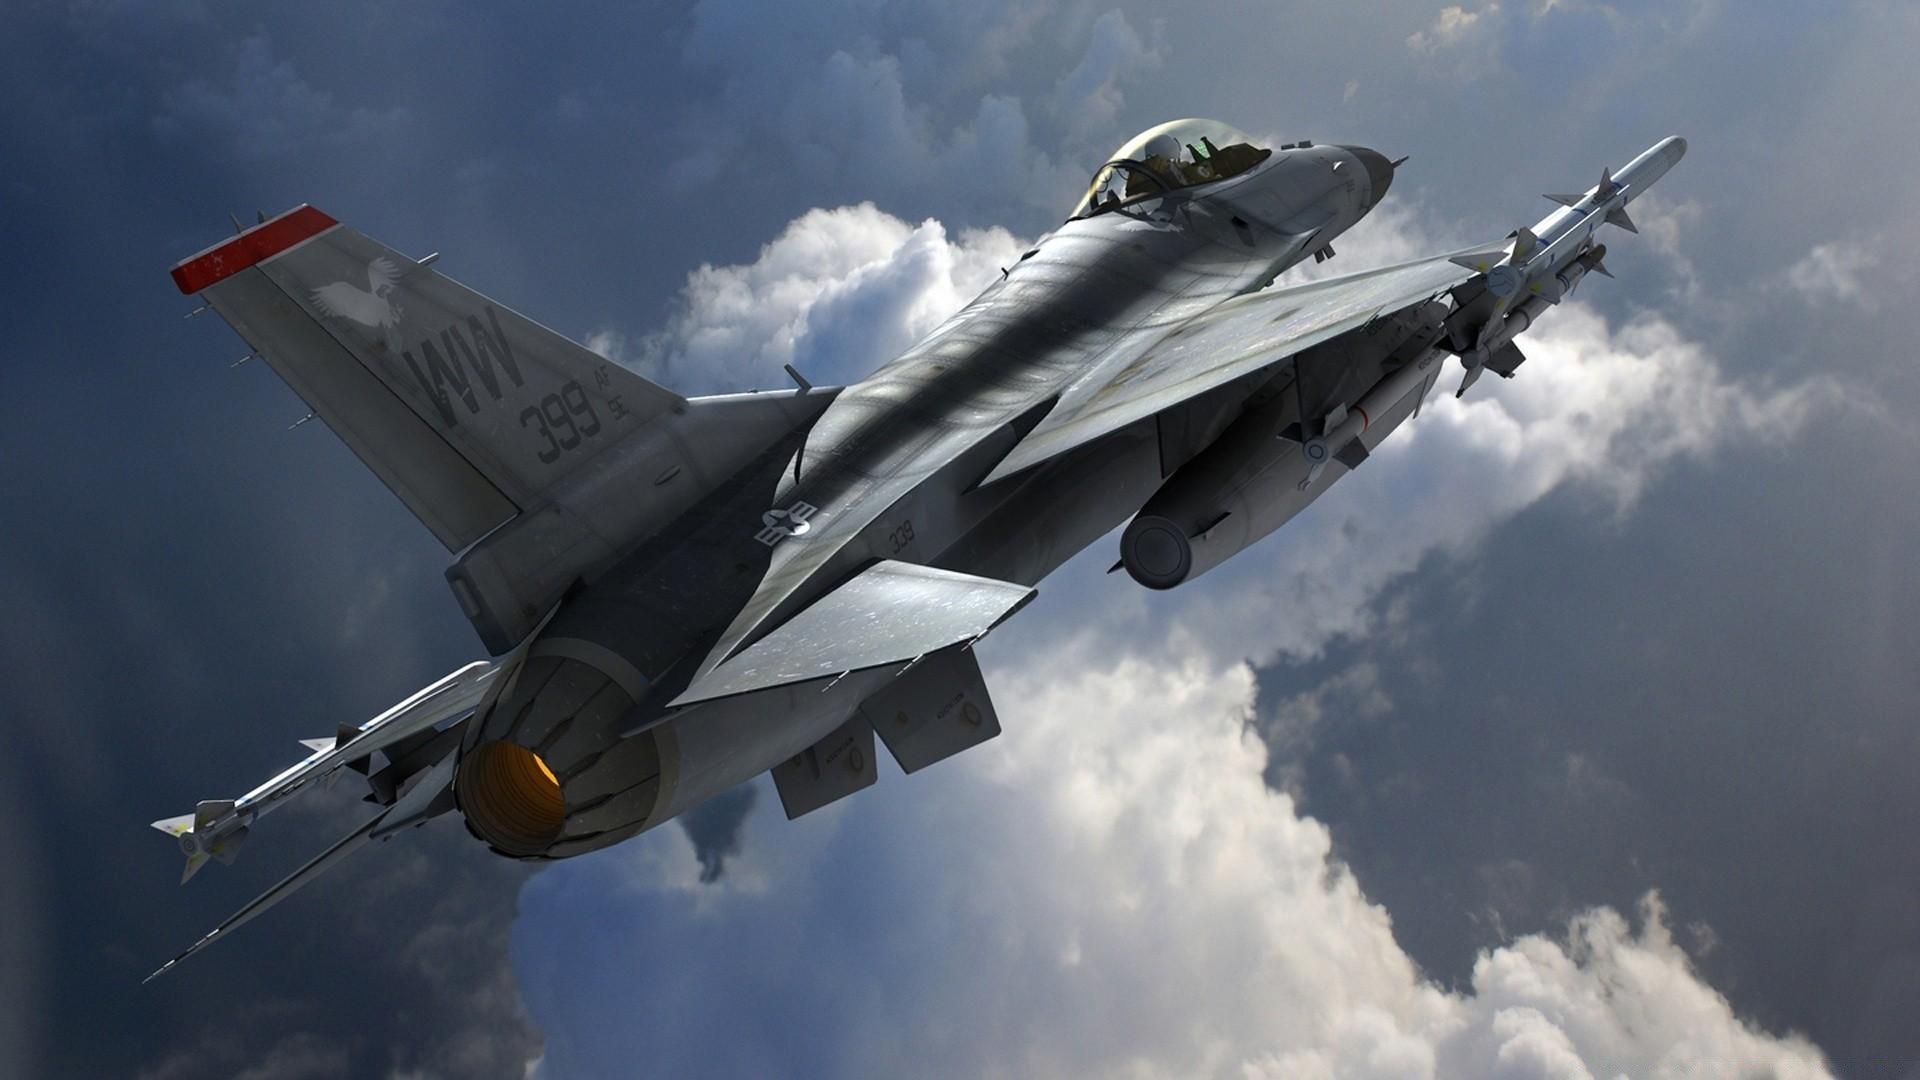 Обои fighting falcon, general dynamics, истребитель. Авиация foto 17